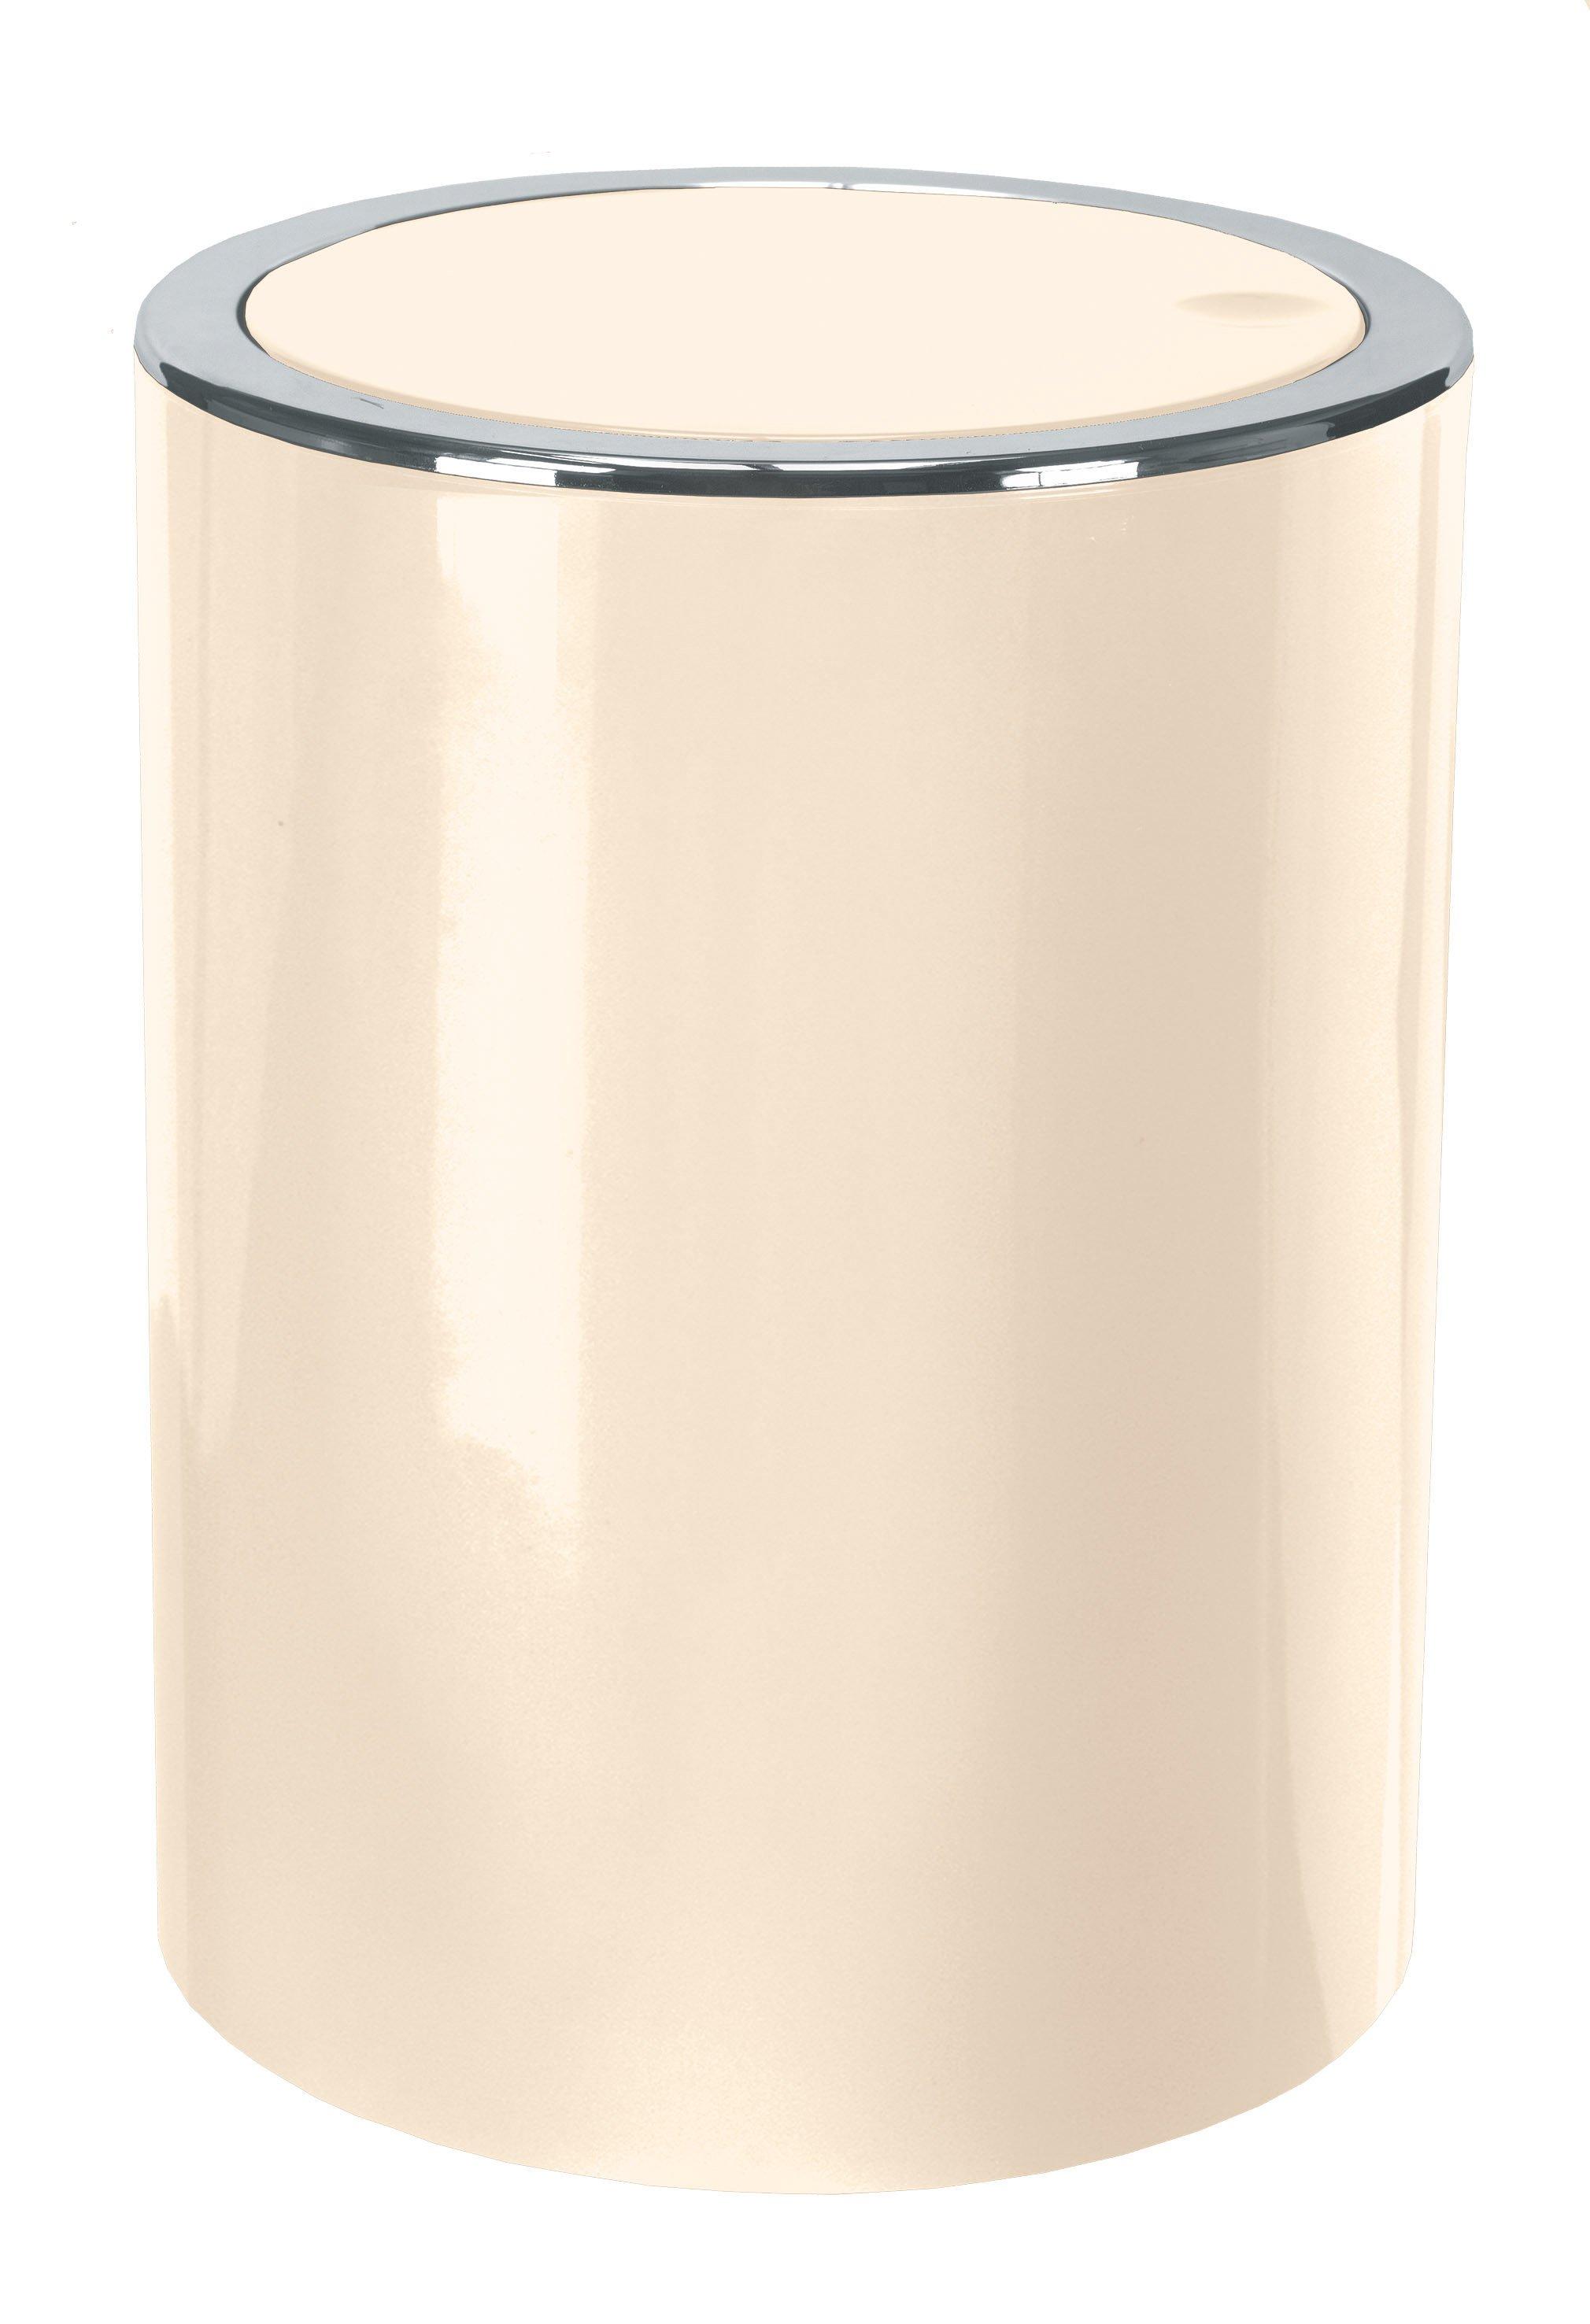 Kosmetikeimer Clap Mini Natur B:11cm